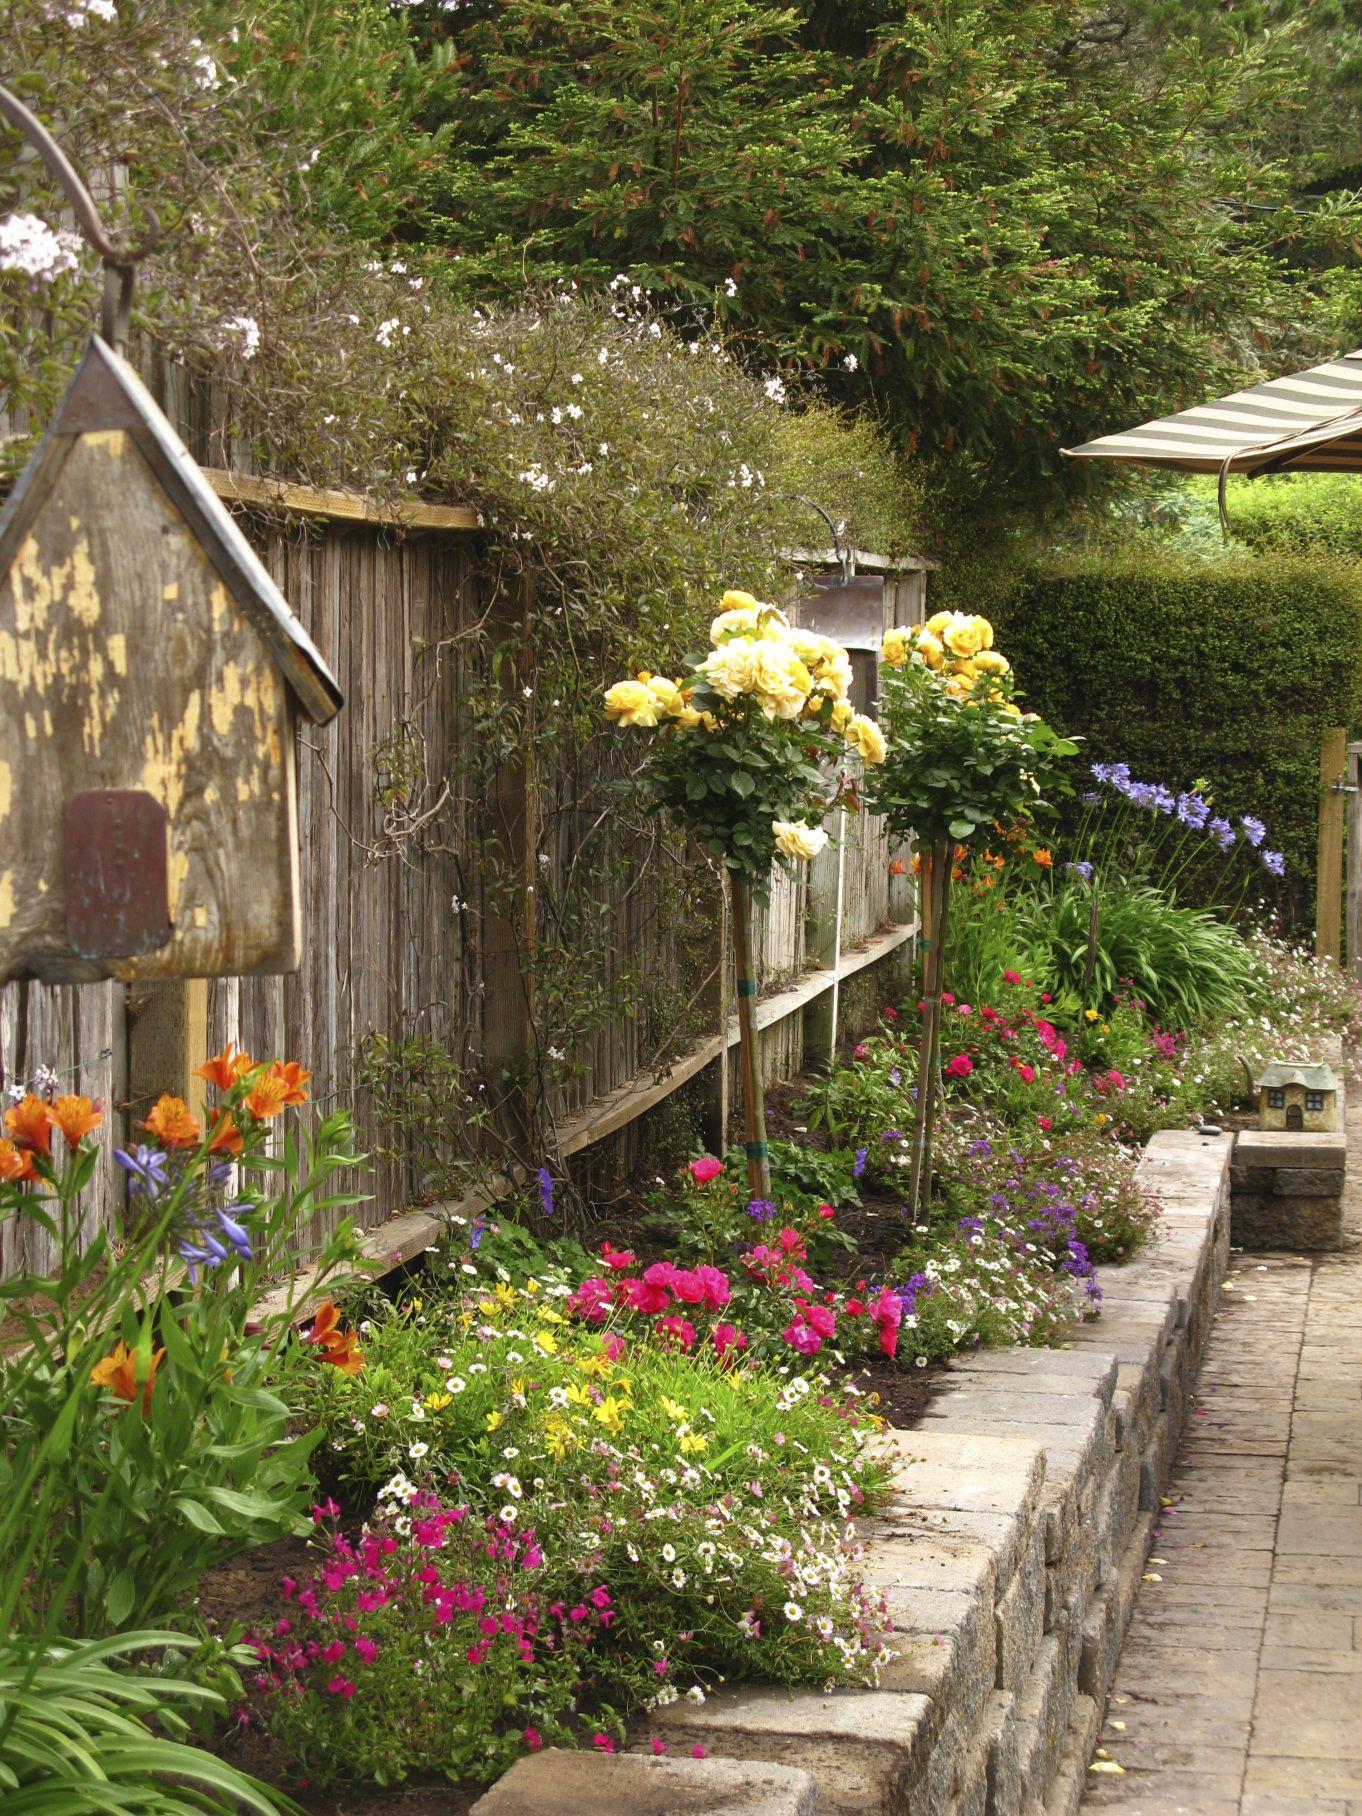 IMG_8955 | Gardening Ideas | Pinterest | Gardens and Landscaping ideas